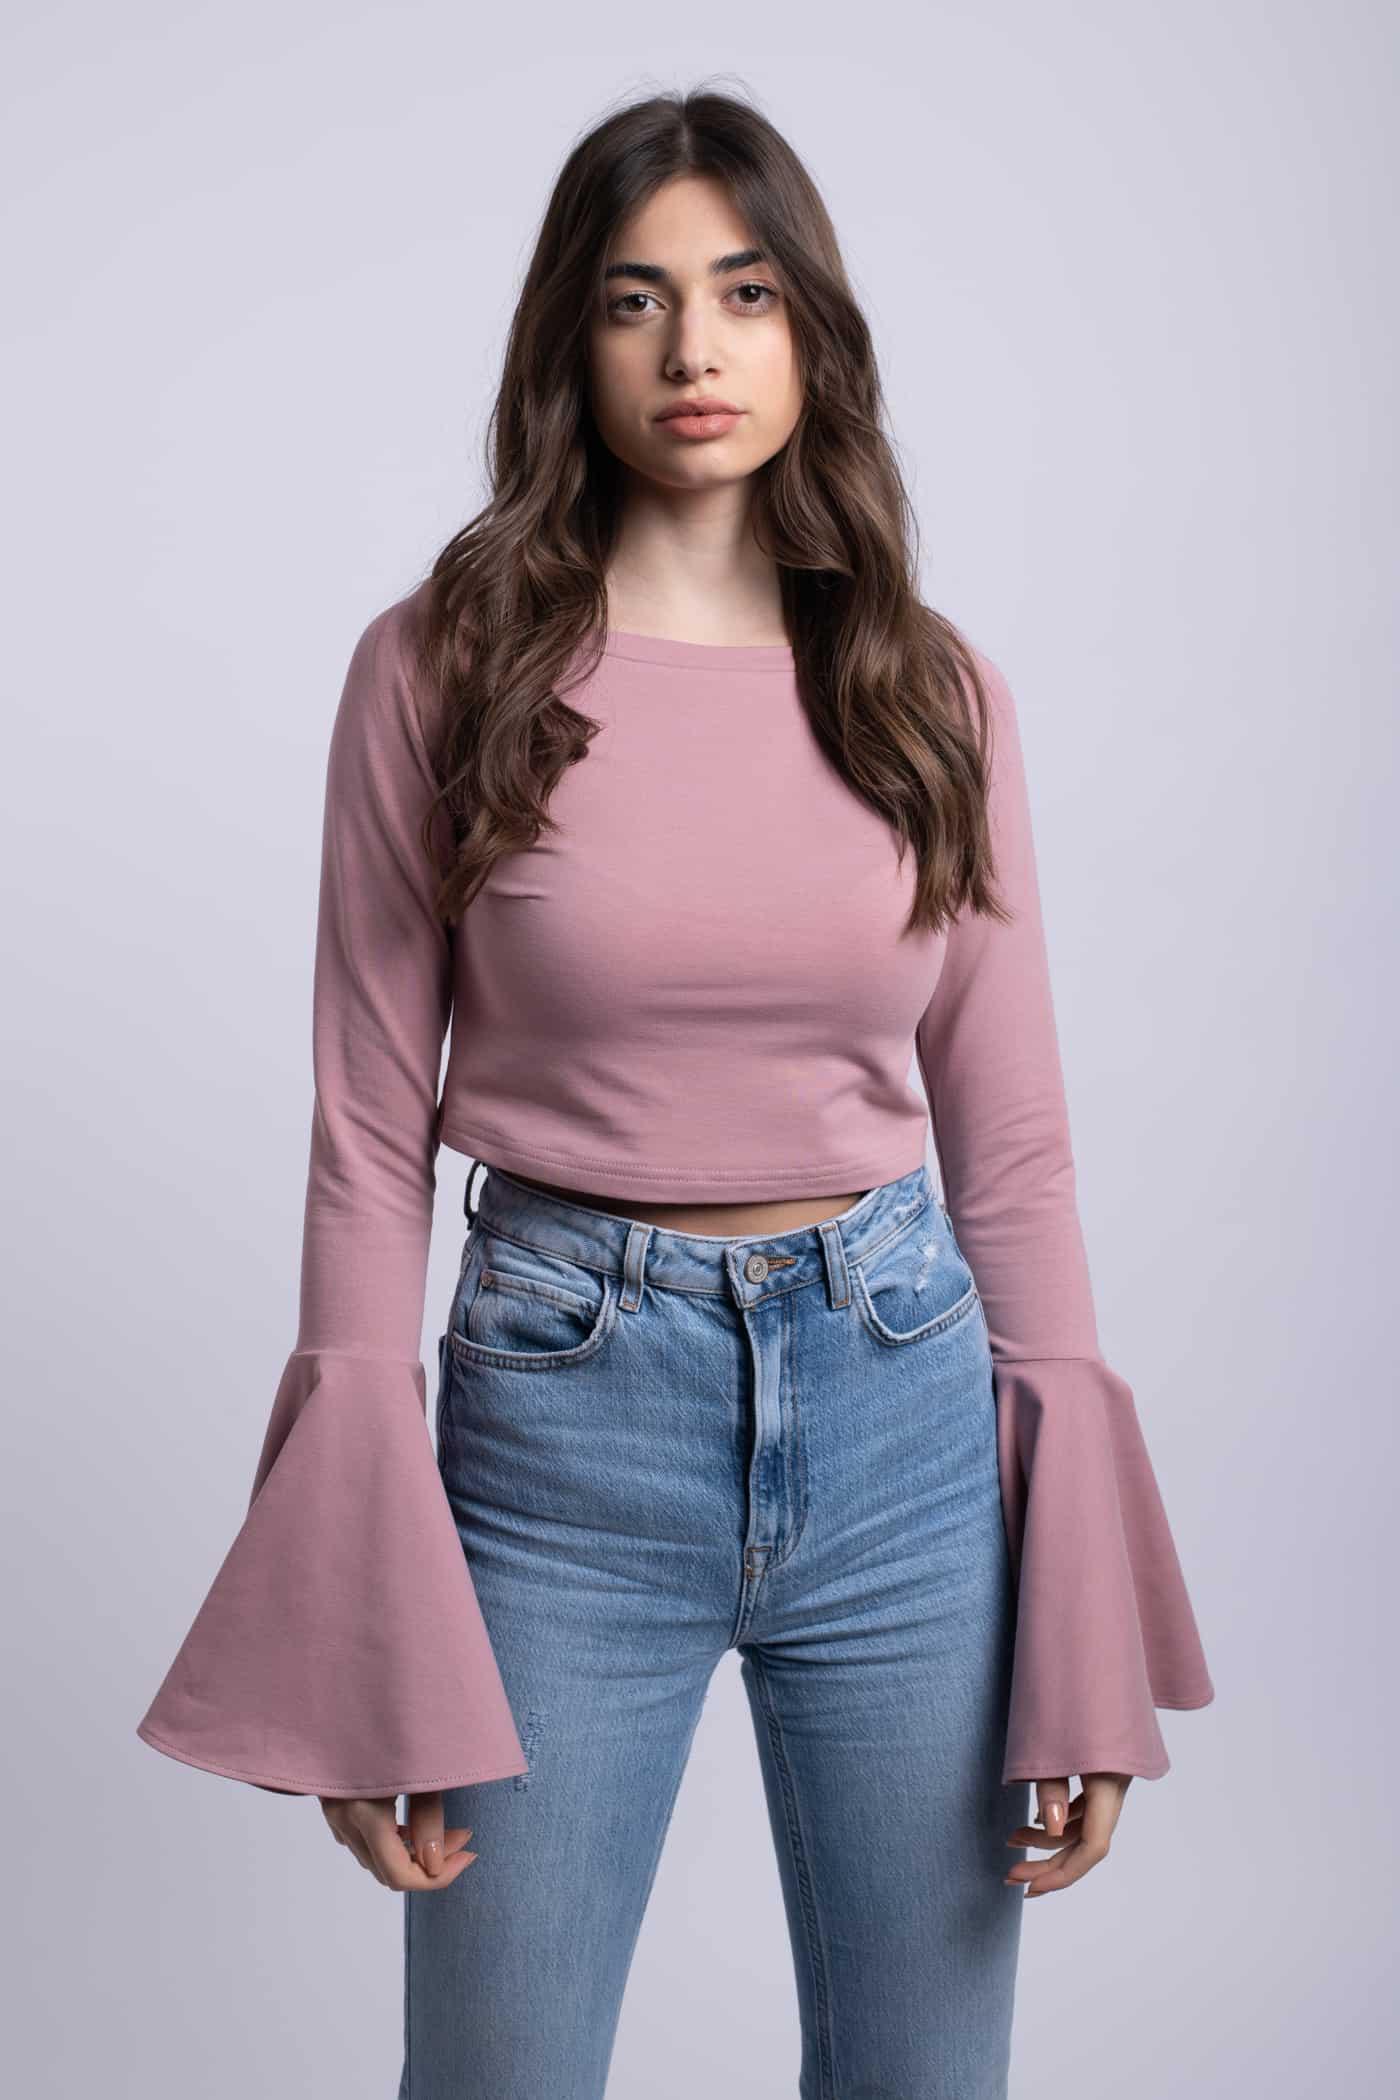 bluza roz pudra crop top simpla